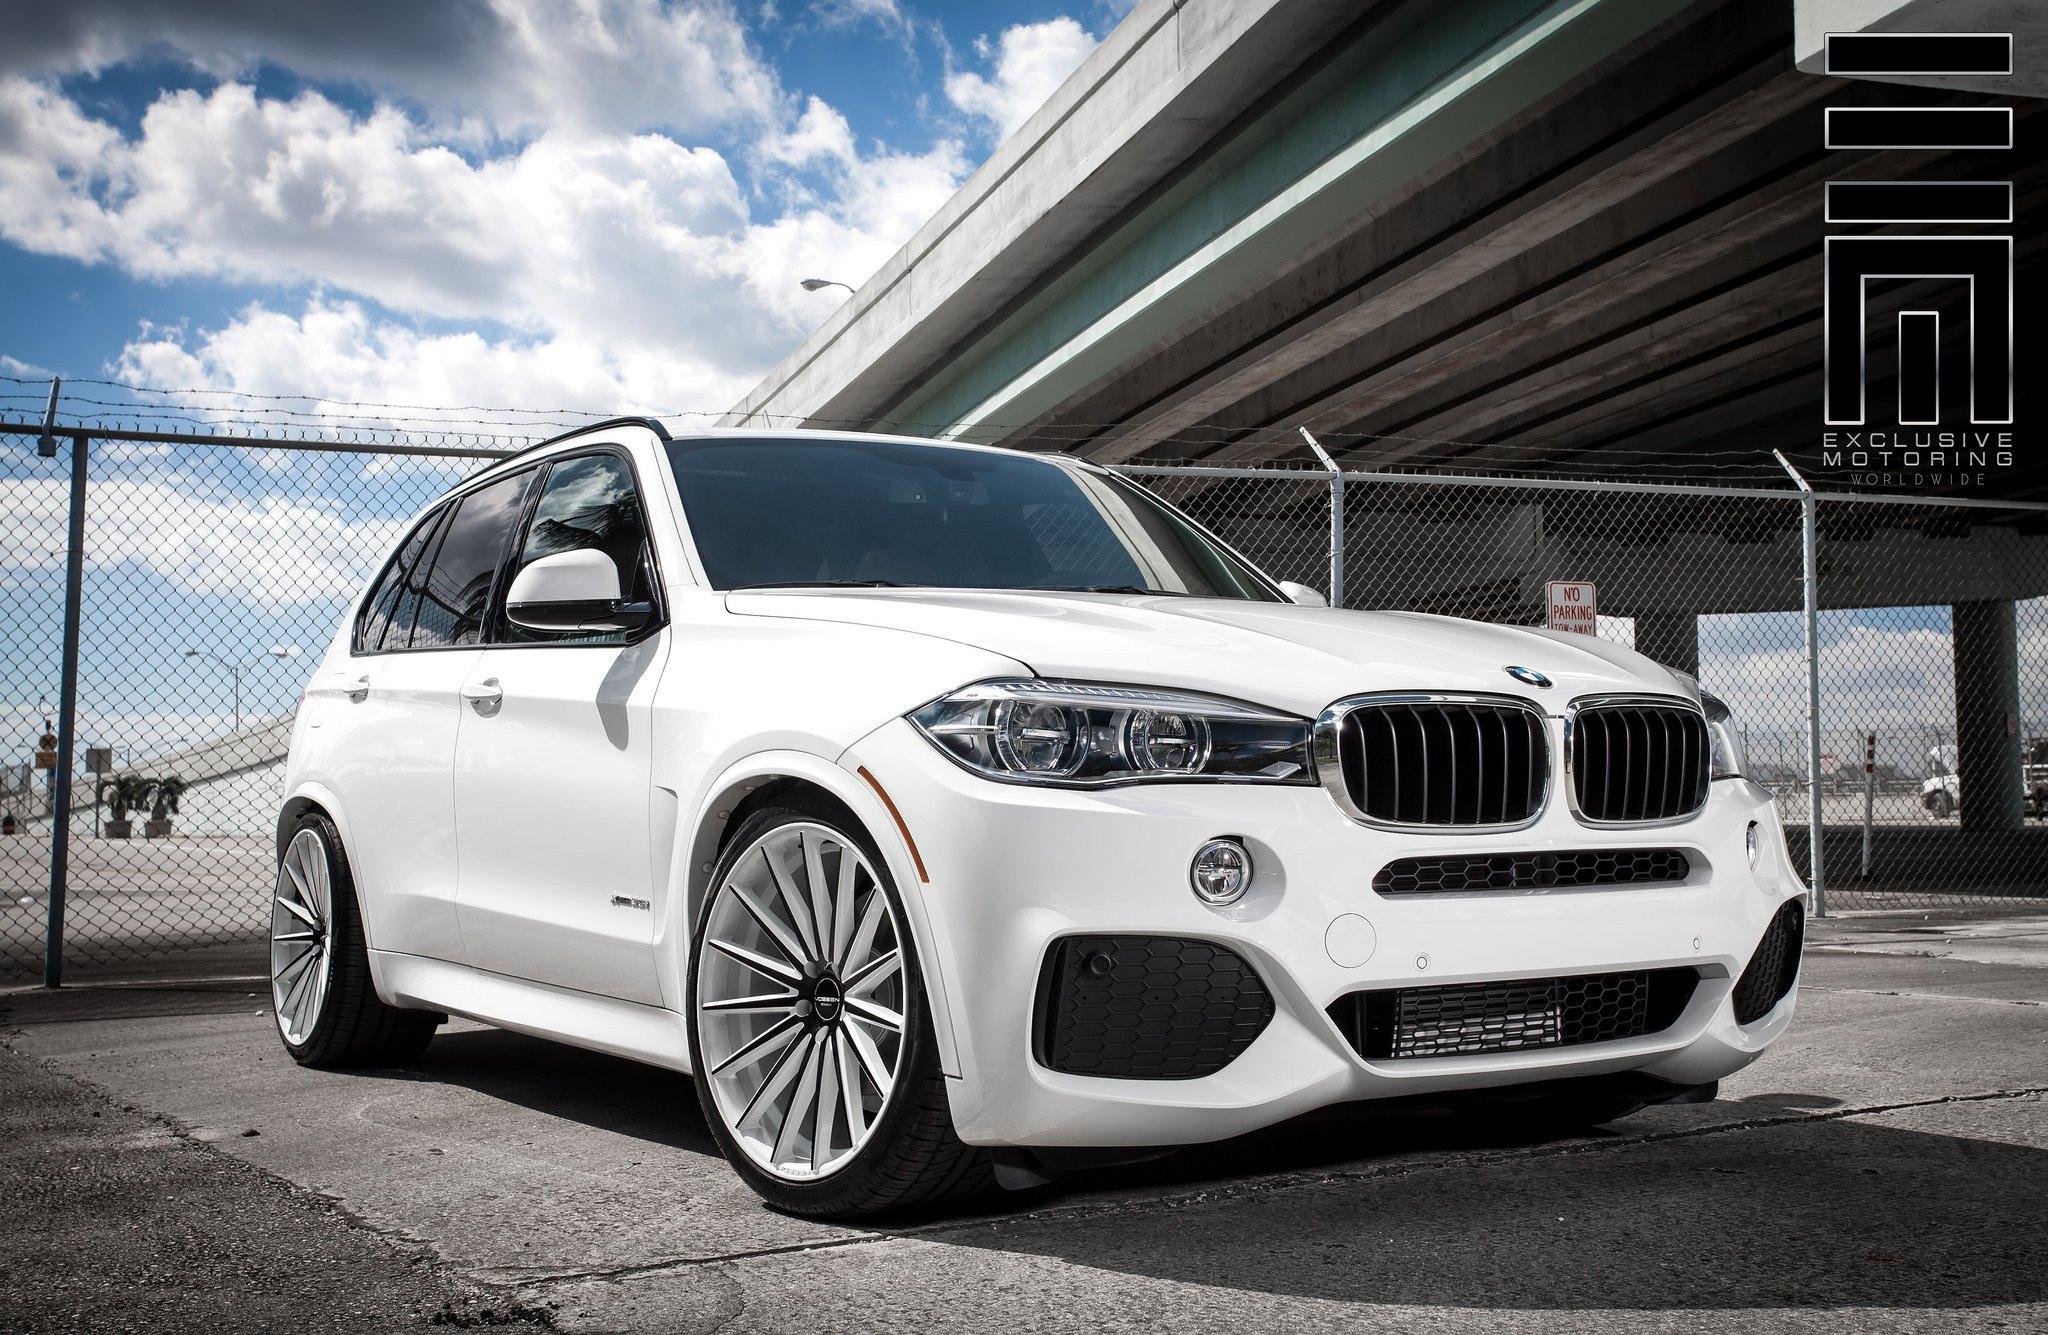 BMW X5 Stanced On Classy Custom Wheels